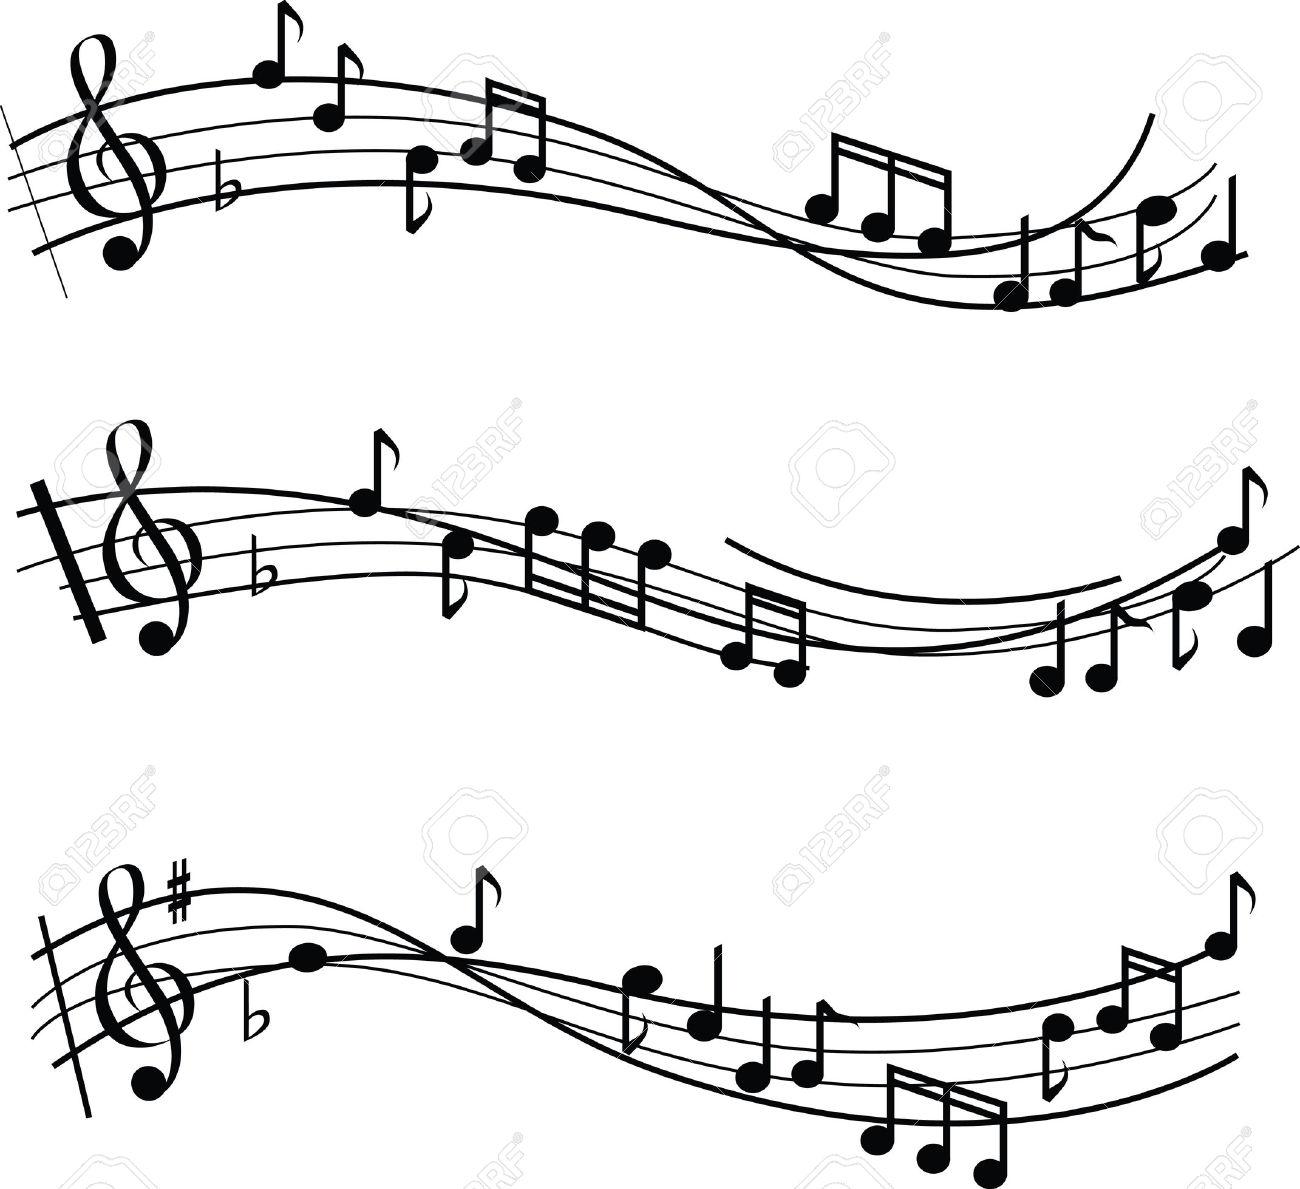 Sheet music clipart image free Sheet music with no musical notes clipart - ClipartFest image free